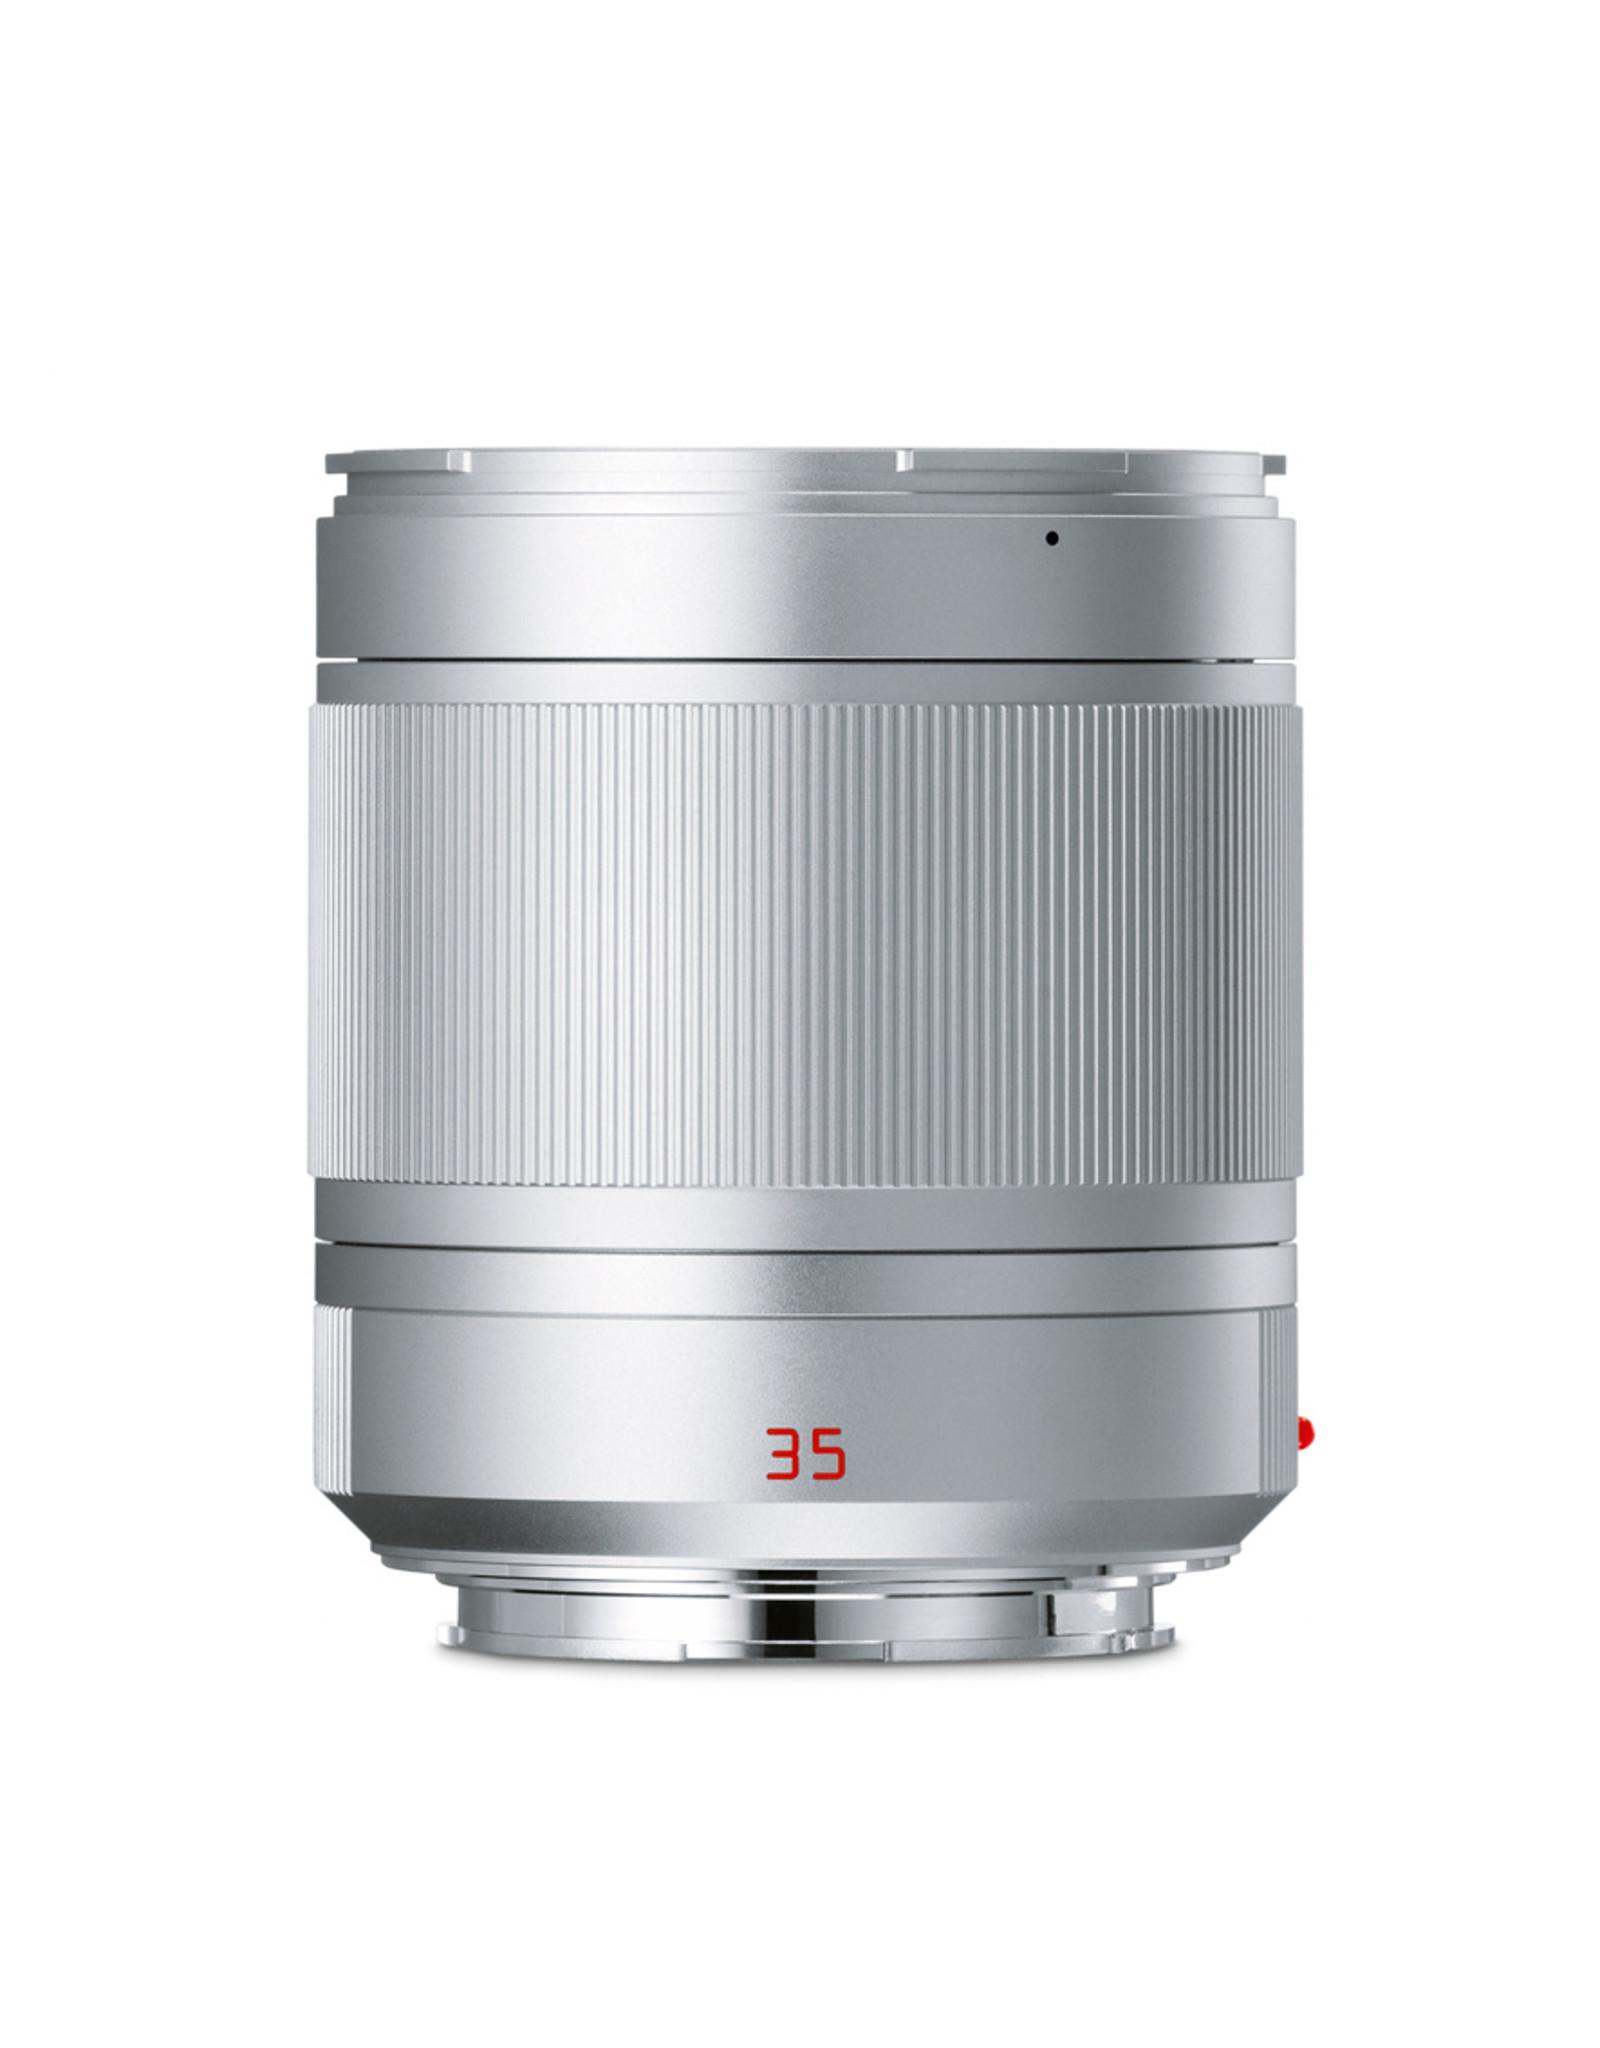 Leica Leica 35mm f1.4 Summilux-TL Silver   110-85